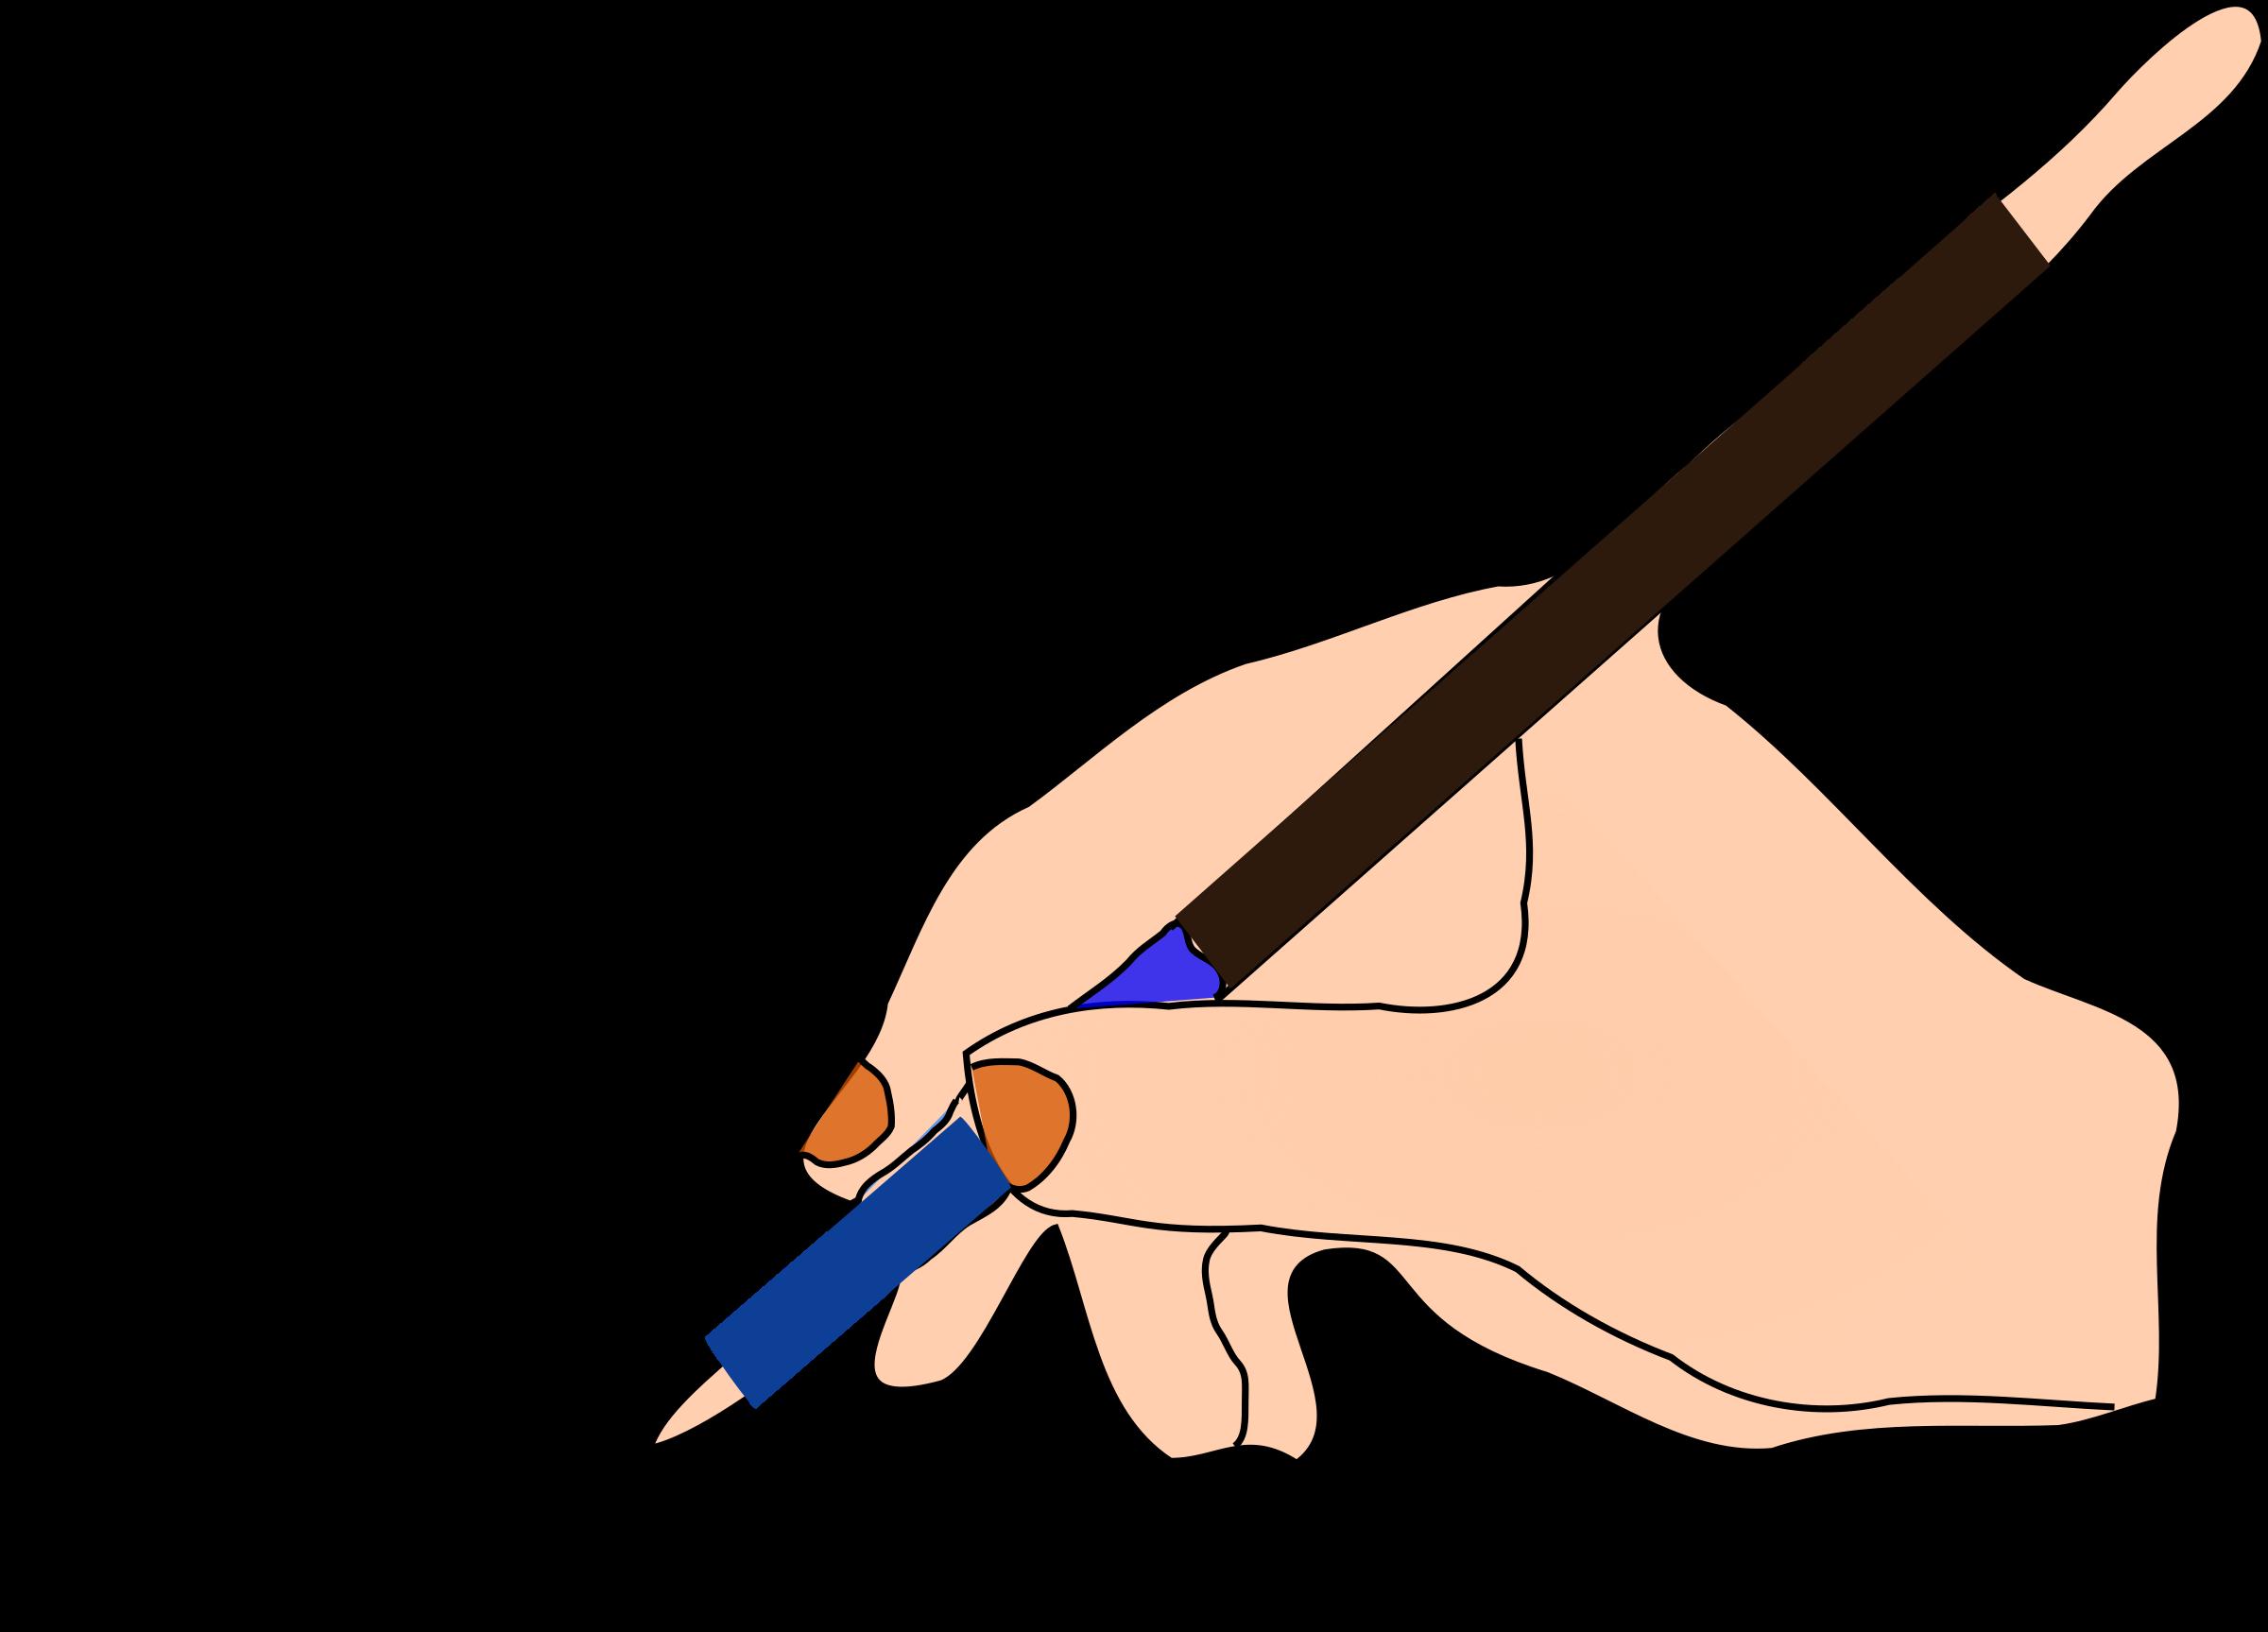 2400x1727 15 Animation Vector Writing For Free Download On Mbtskoudsalg